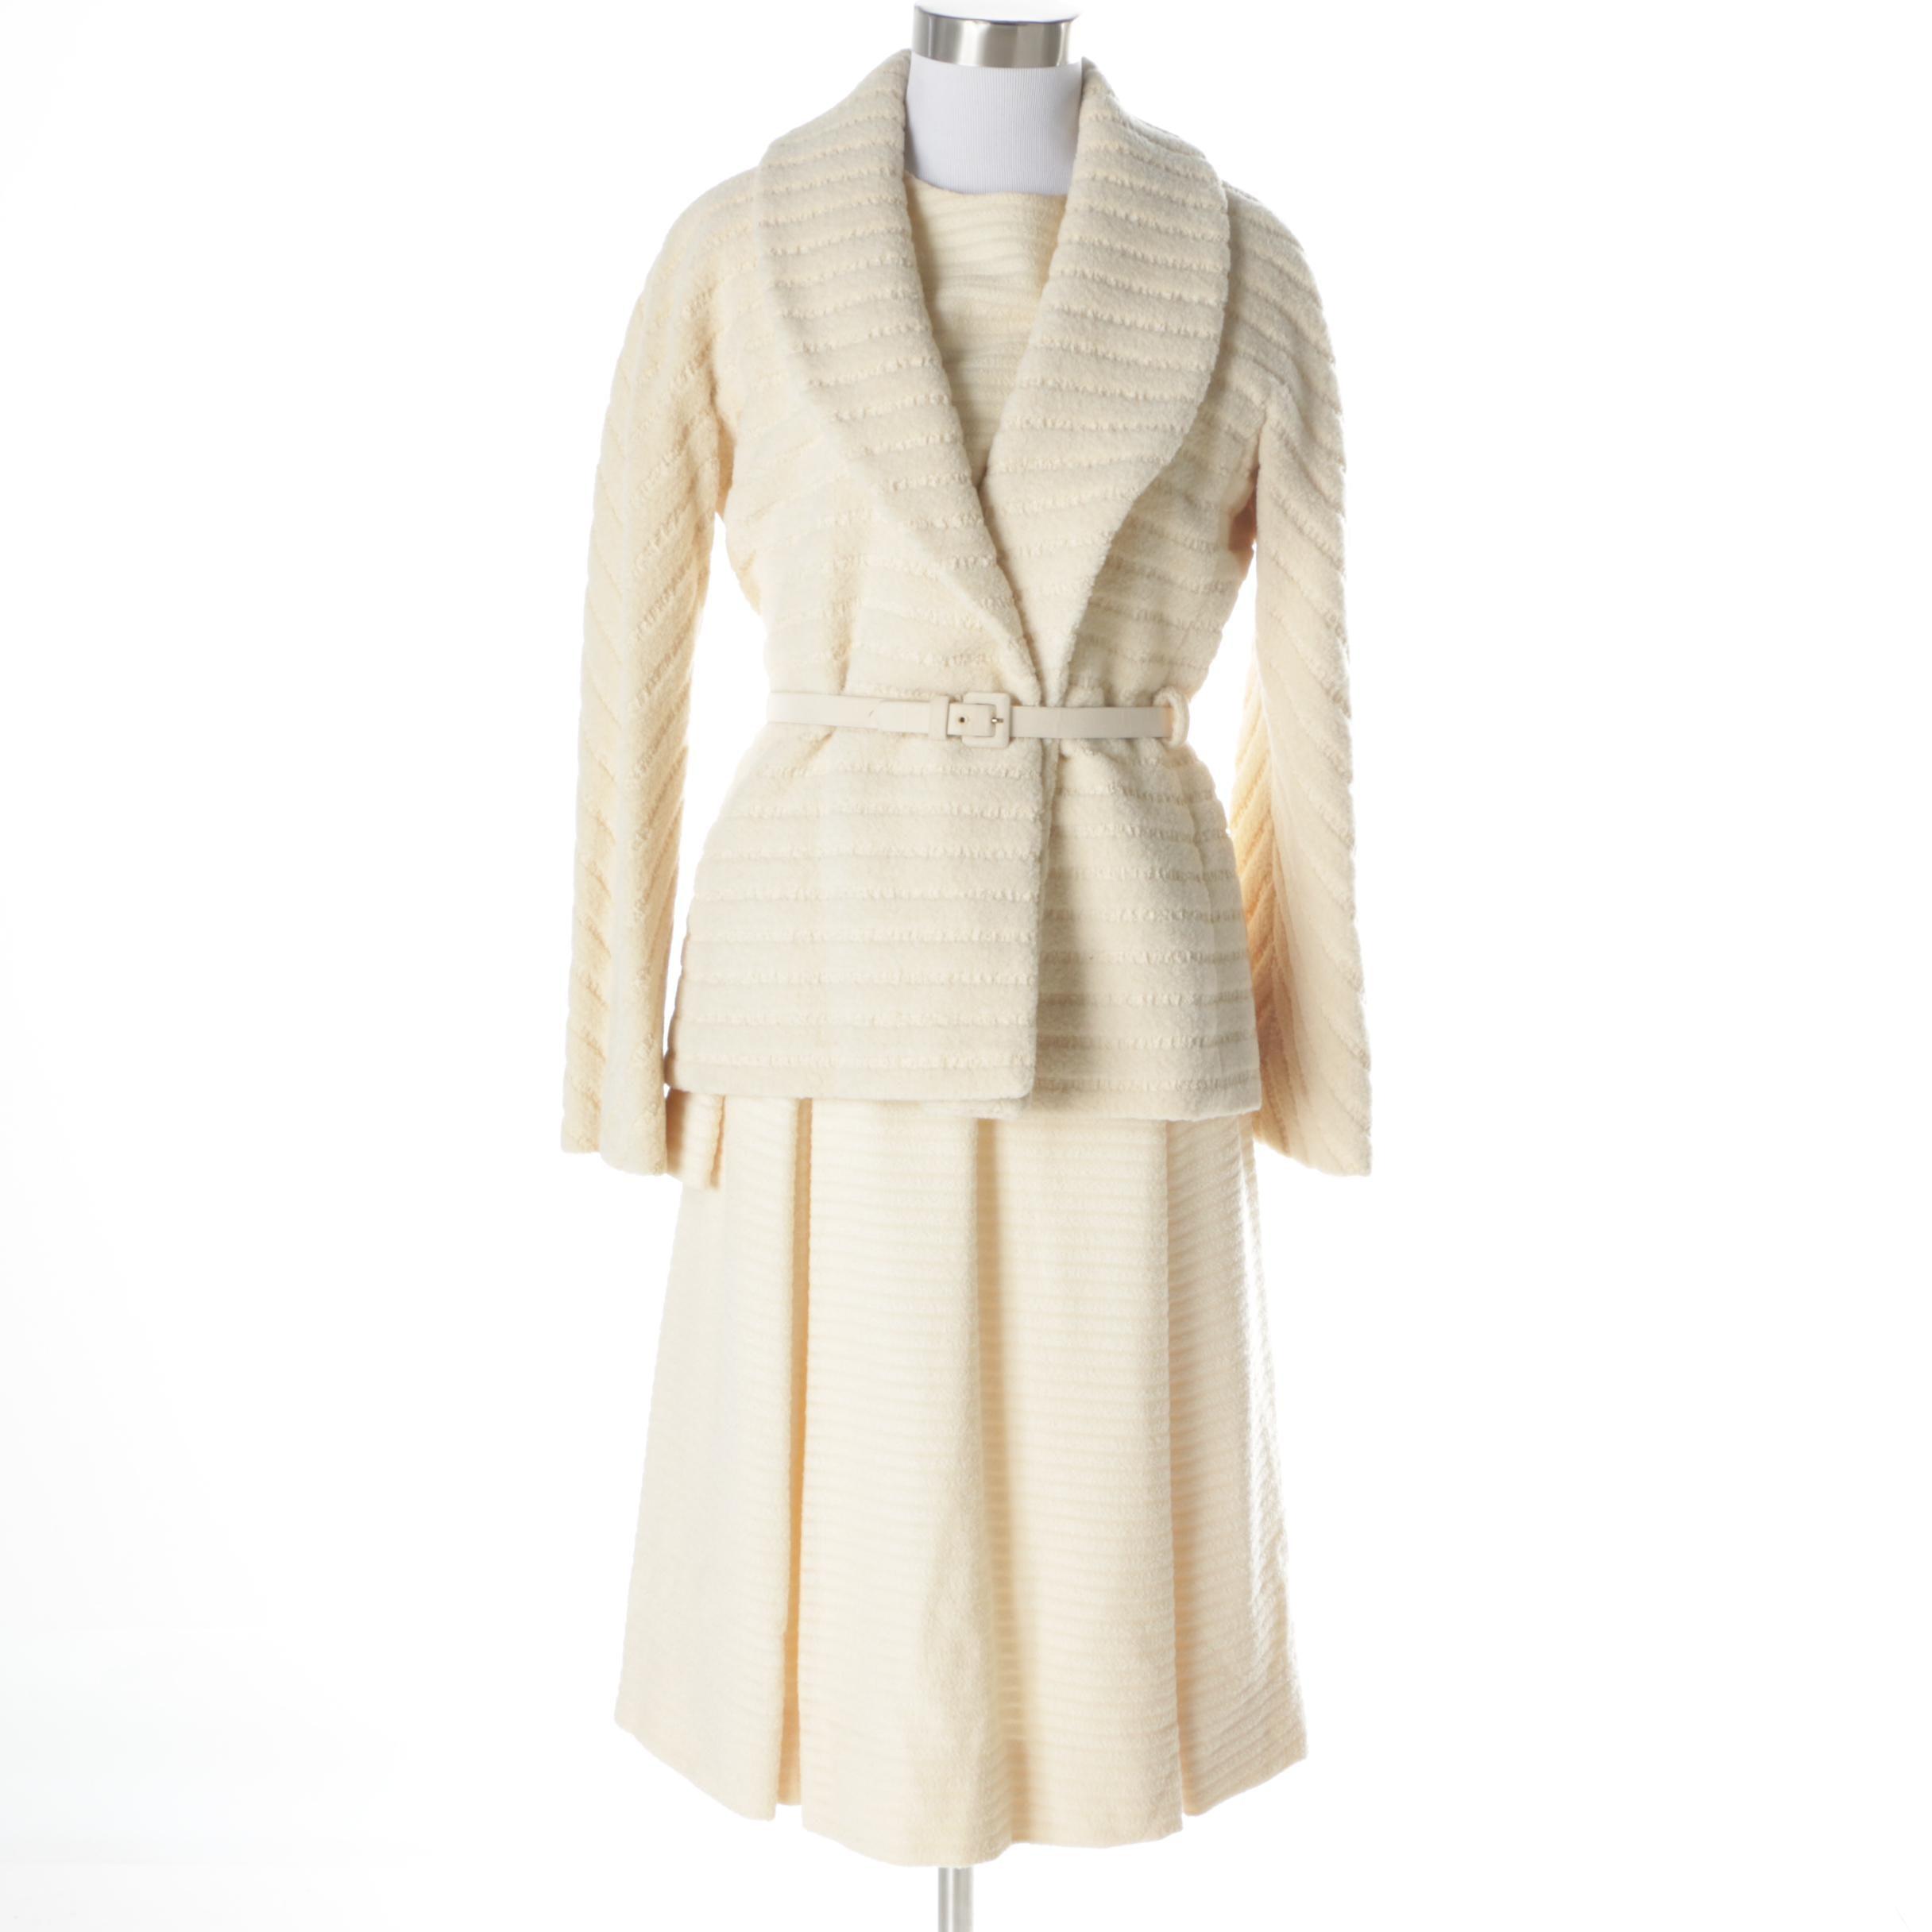 Vintage Cardinali Wool Blend Jacket Dress